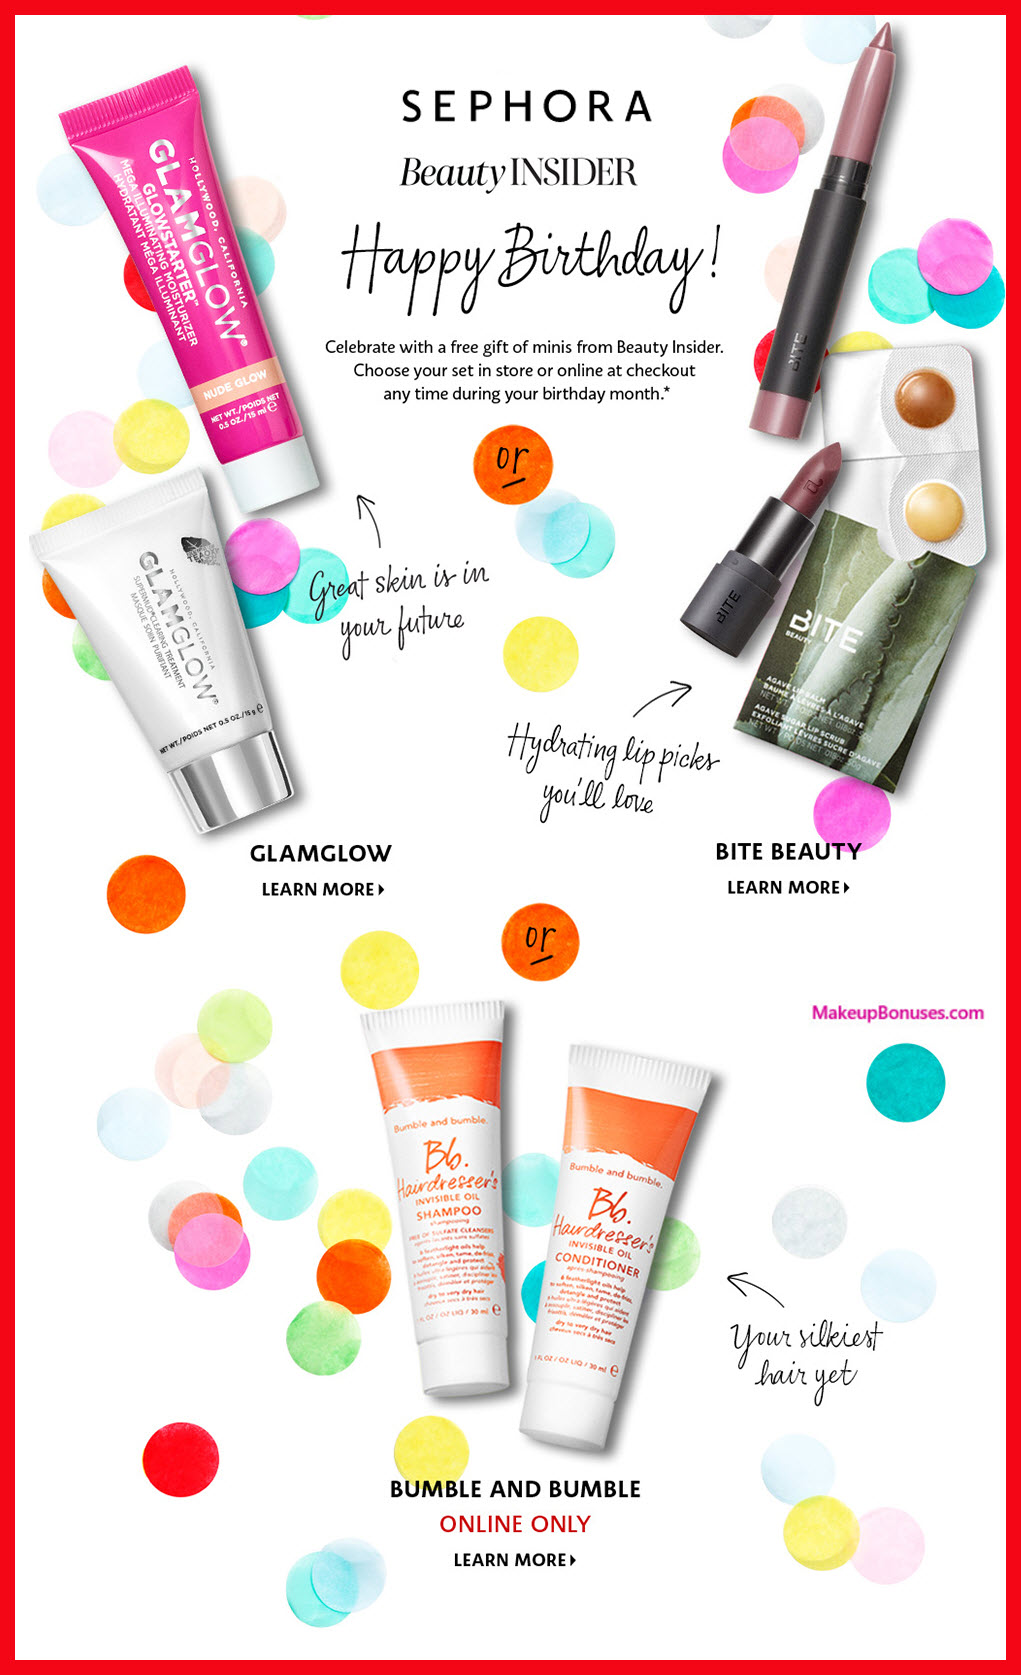 SEPHORA Birthday Gift MakeupBonuses.com 2018